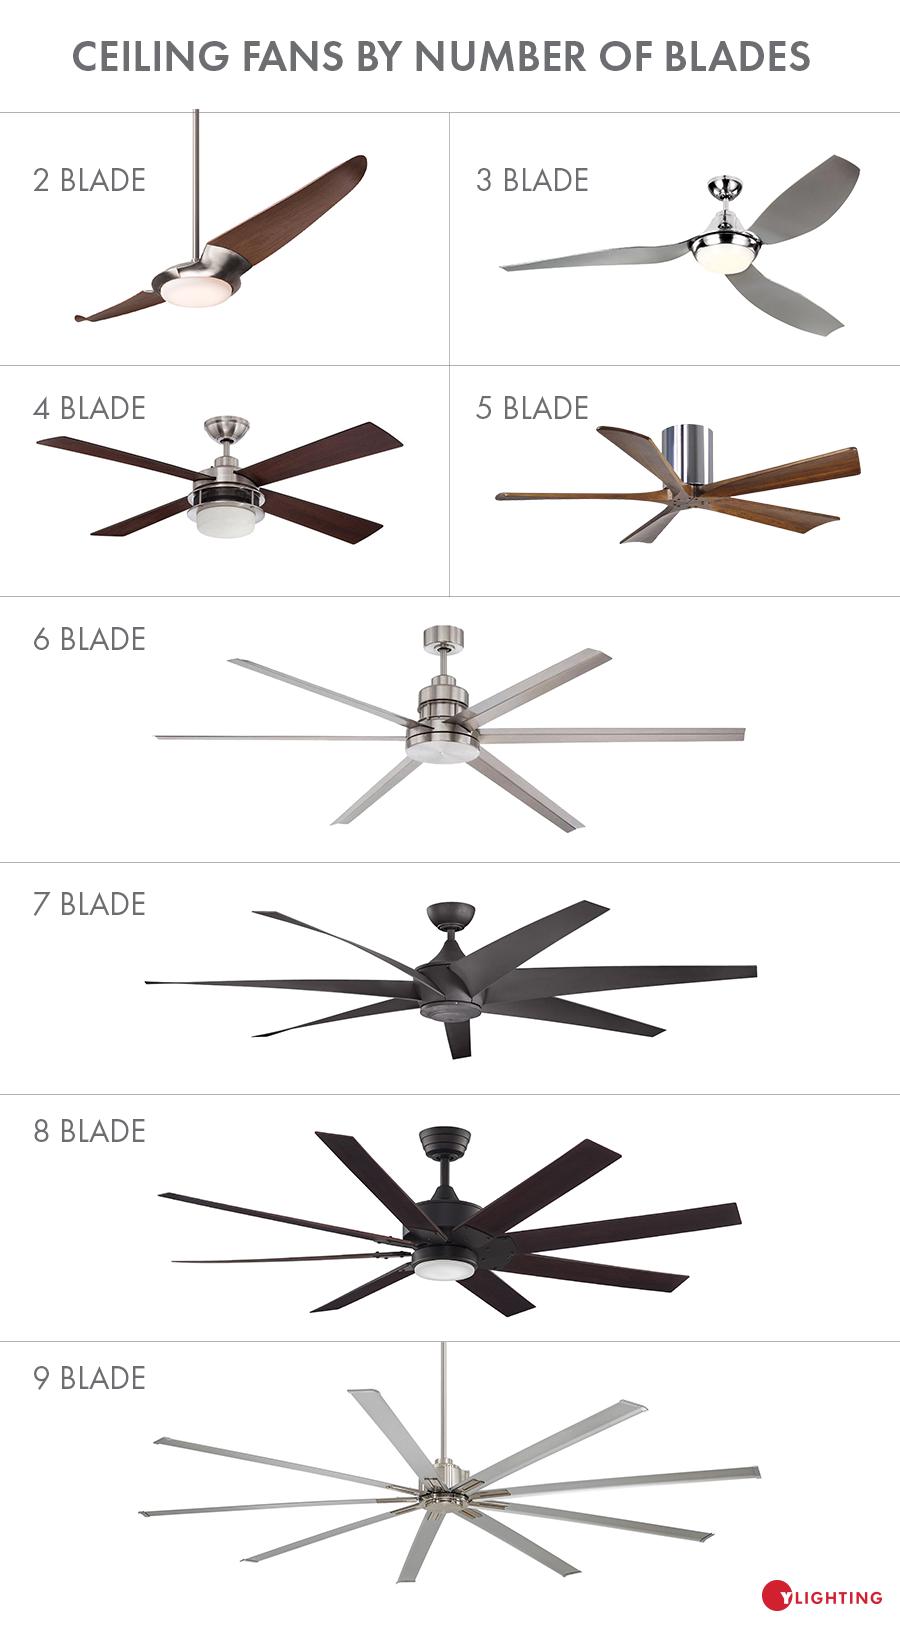 How To Choose A Ceiling Fan Size Guide Blades Airflow Ceiling Fan Size Living Room Ceiling Fan Modern Ceiling Fan